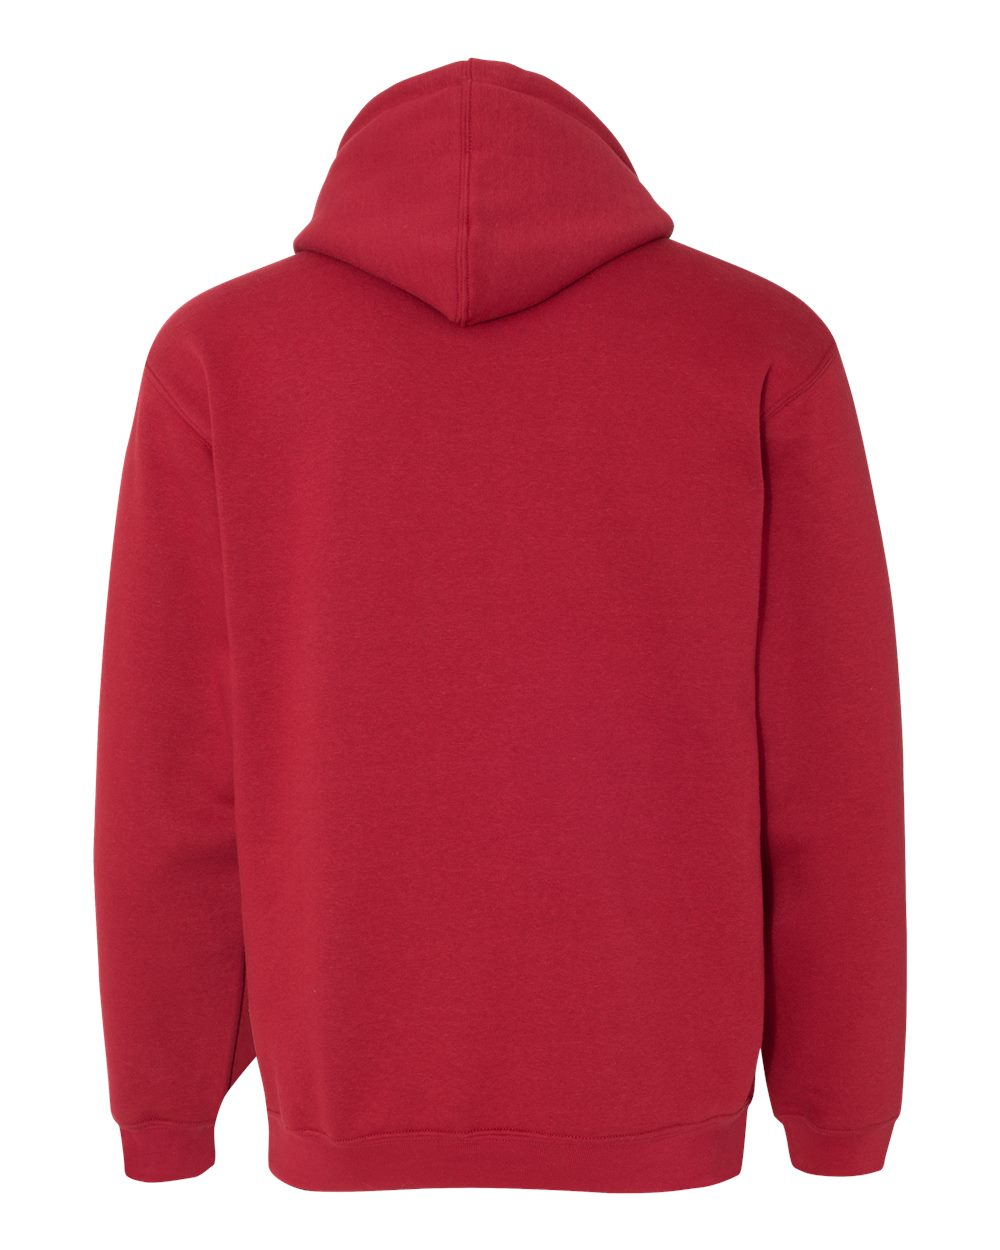 Bayside-Mens-Blank-USA-Made-Hooded-Sweatshirt-960-up-to-6XL miniature 10